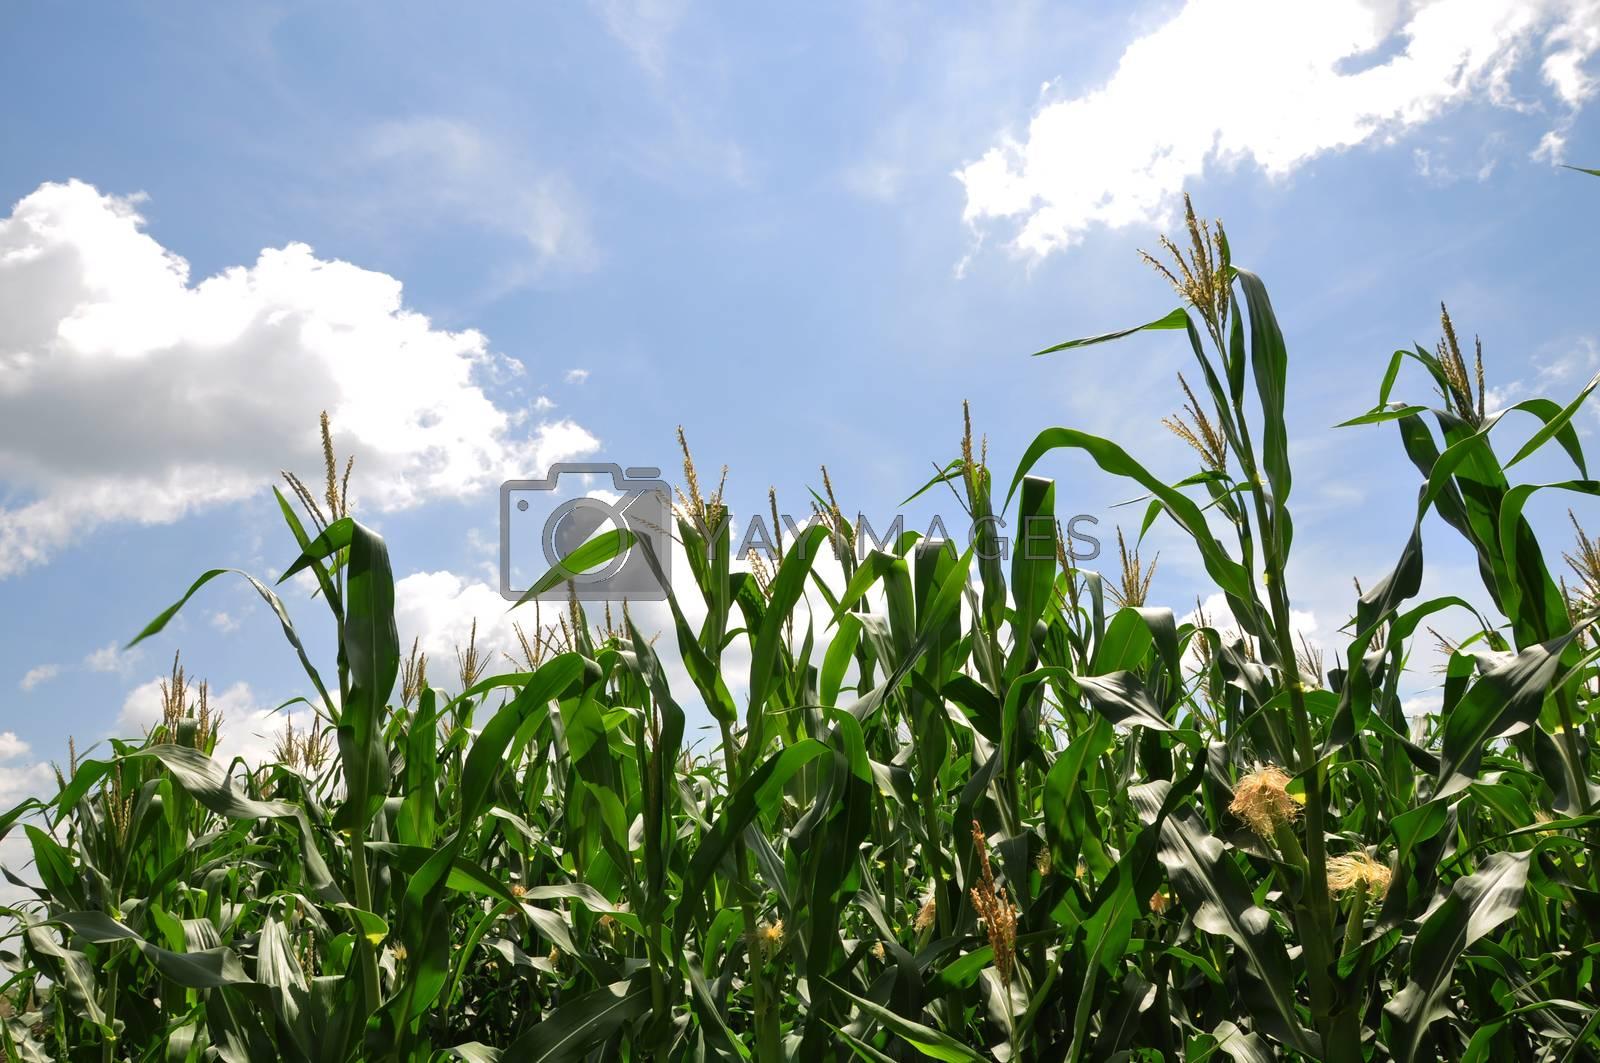 Royalty free image of Corn field by Nikola30